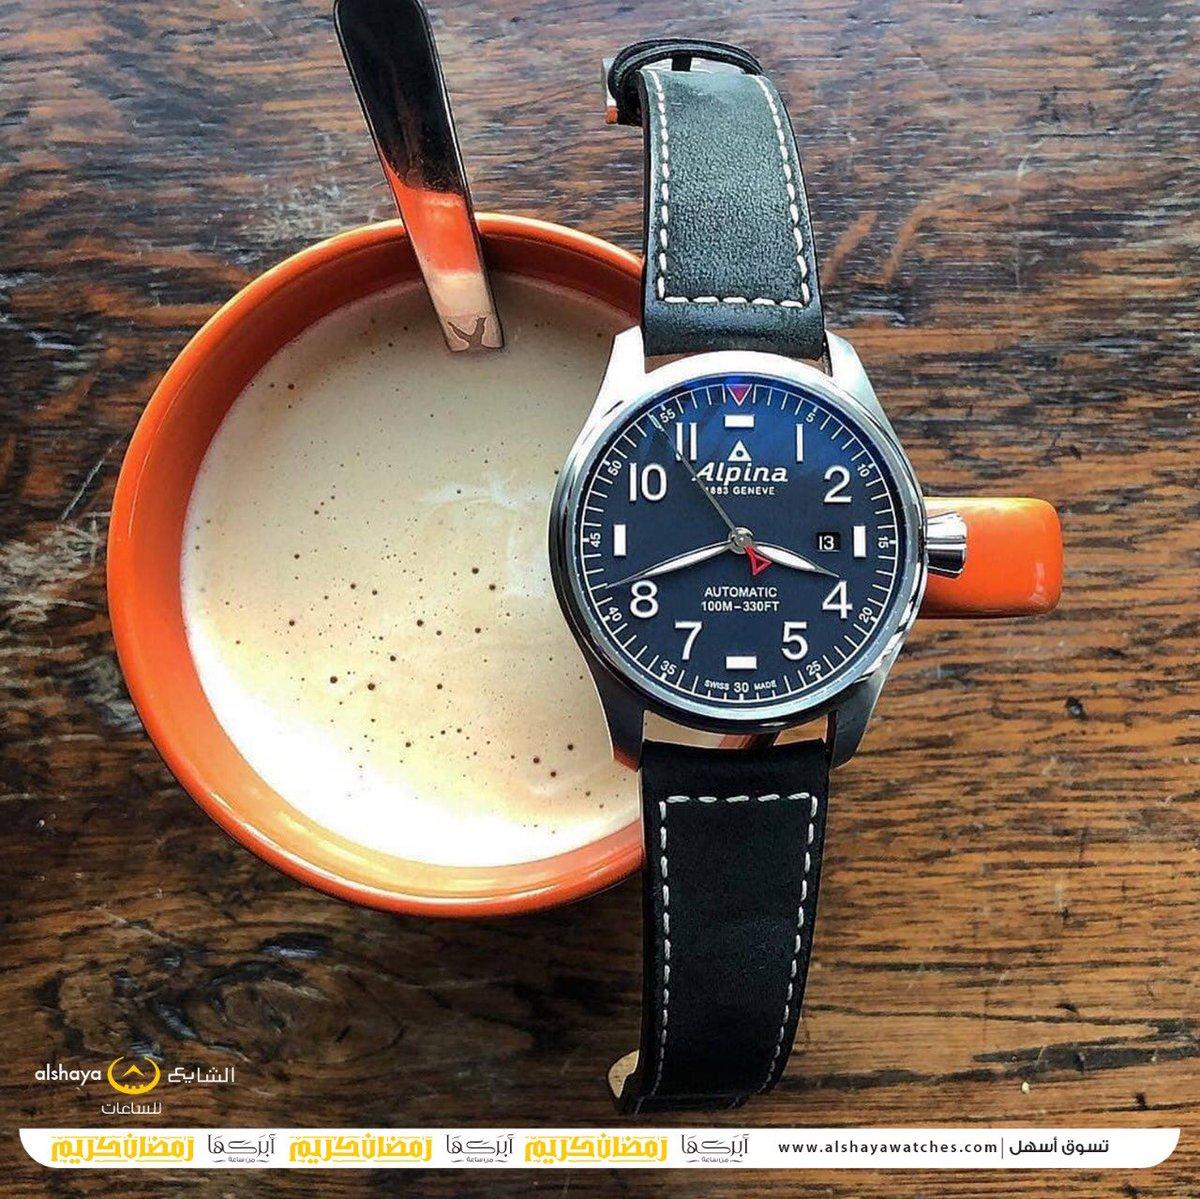 5c9ee0ceafe1b ... بميناء أزرق داكن ونظام عمل  أتوماتيكي ساعة ذات روح كلاسيكية خاصة بها  تزيدك تميزًا و أناقة . متوفرة لدى معارض   الشايع للساعاتpic.twitter.com 5E6aPrGpnu